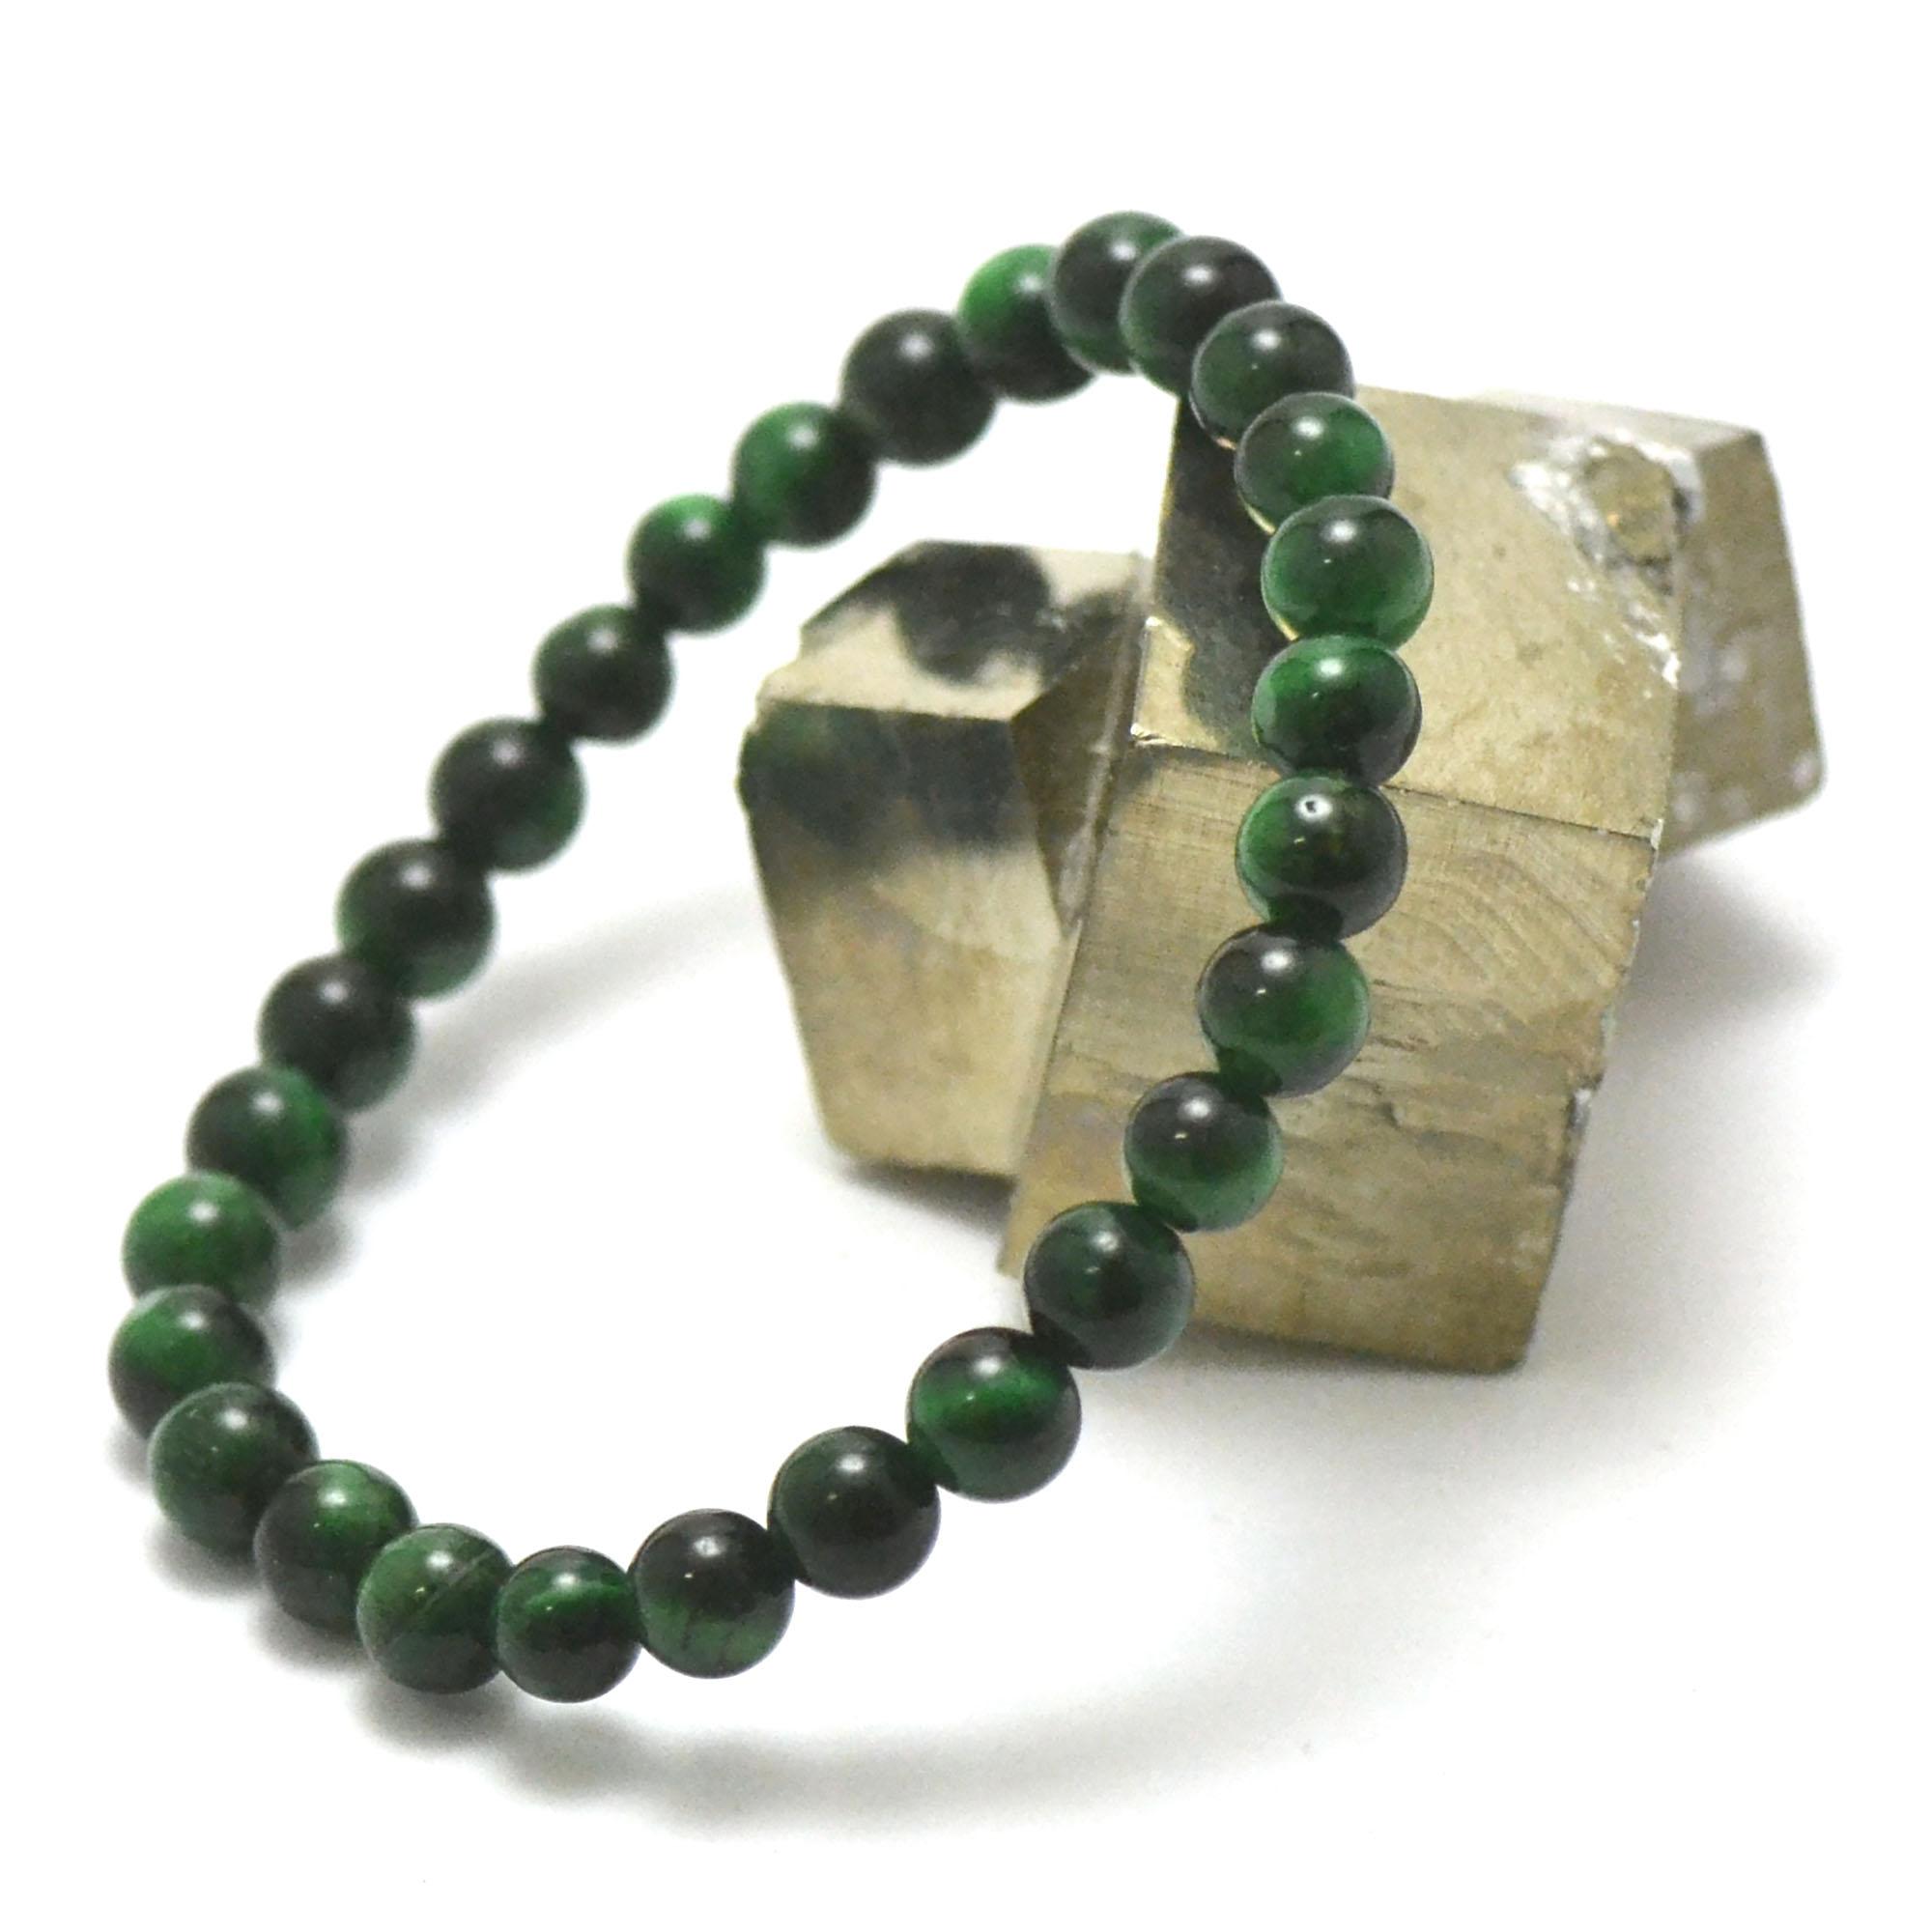 Bracelet oeil de tigre vert perle ronde 6 mm